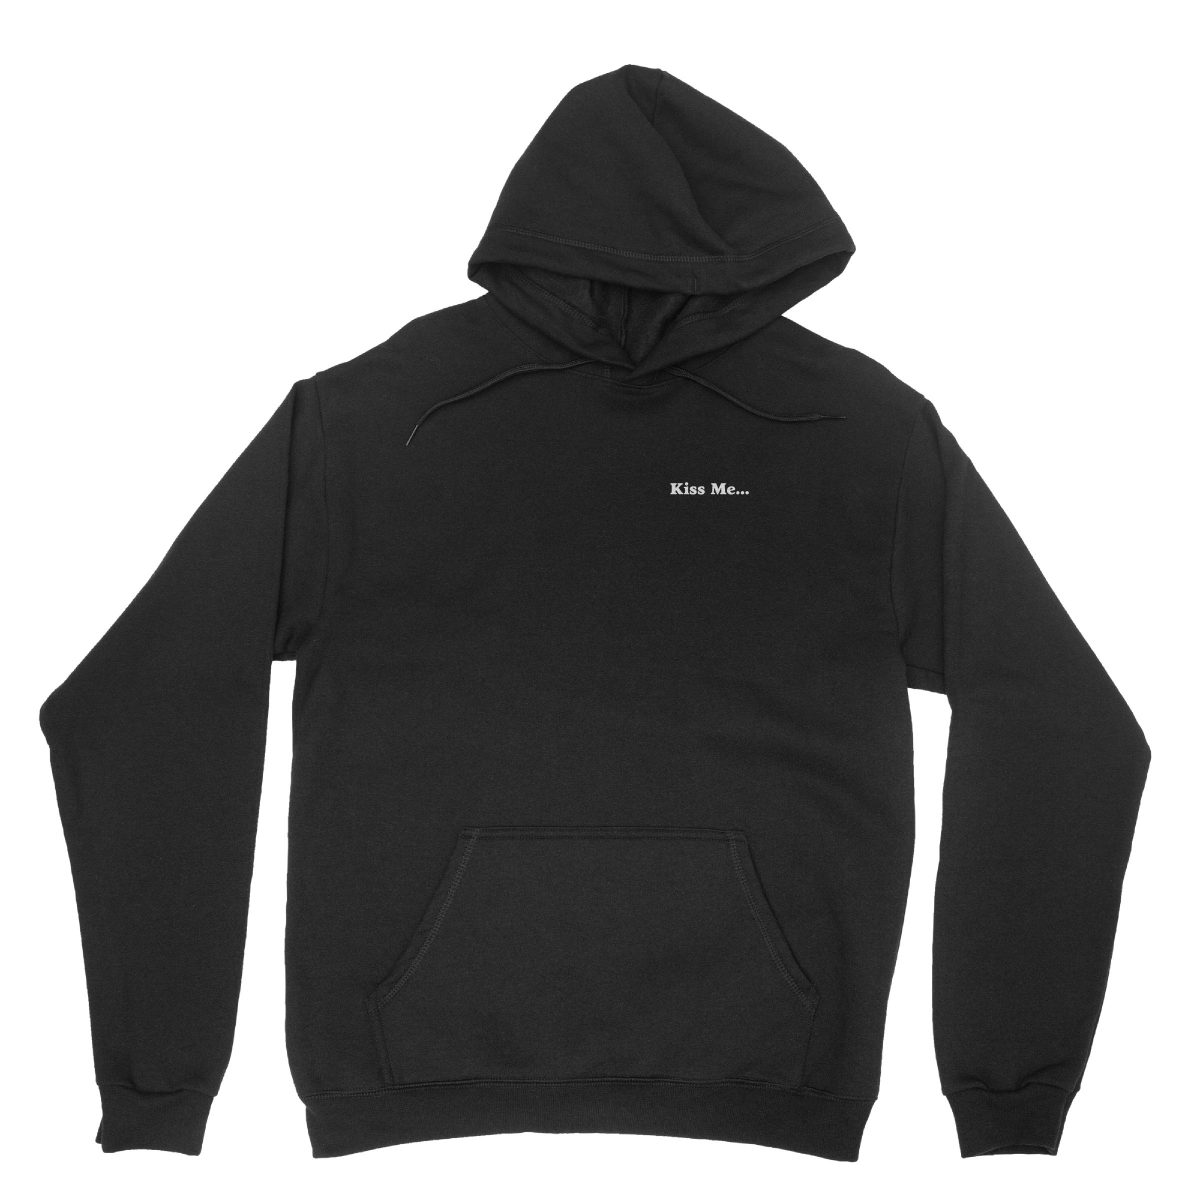 """kiss me between my legs"" hidden message hoodies in black by kikicutt"